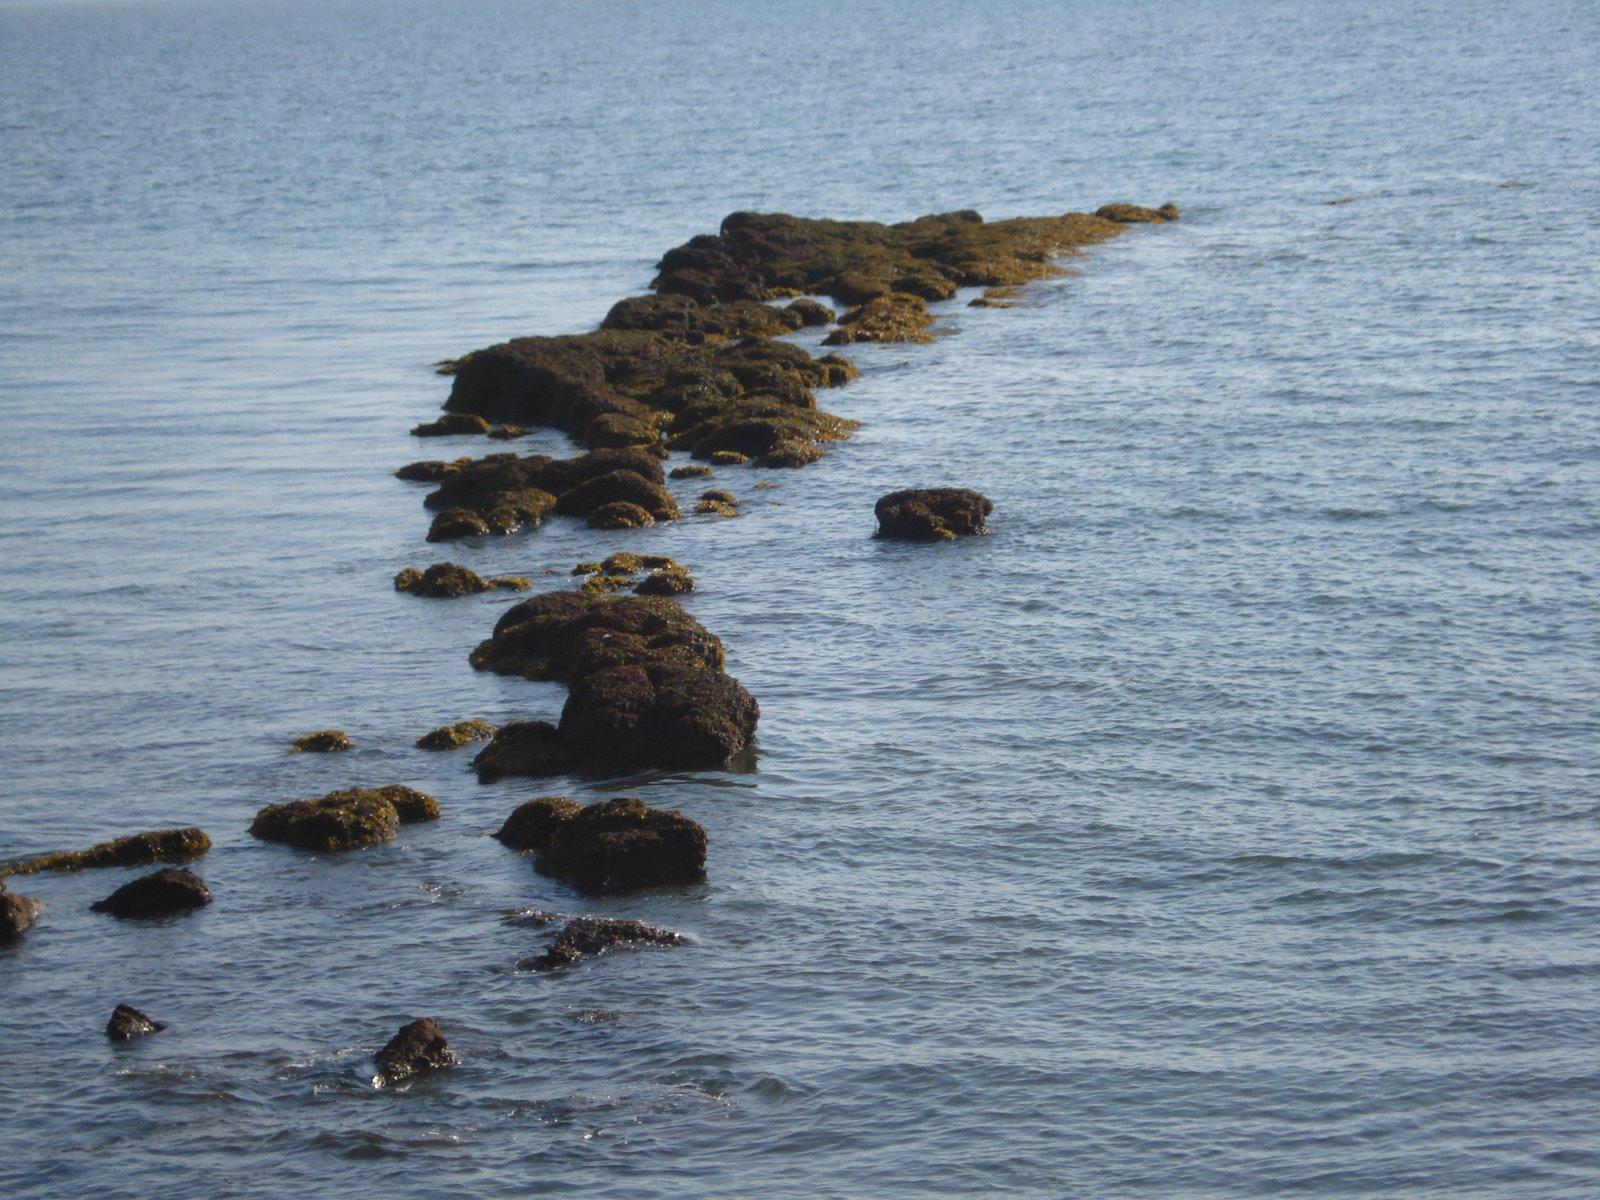 Behind goa beach rocks hidden cambootytk - 1 4